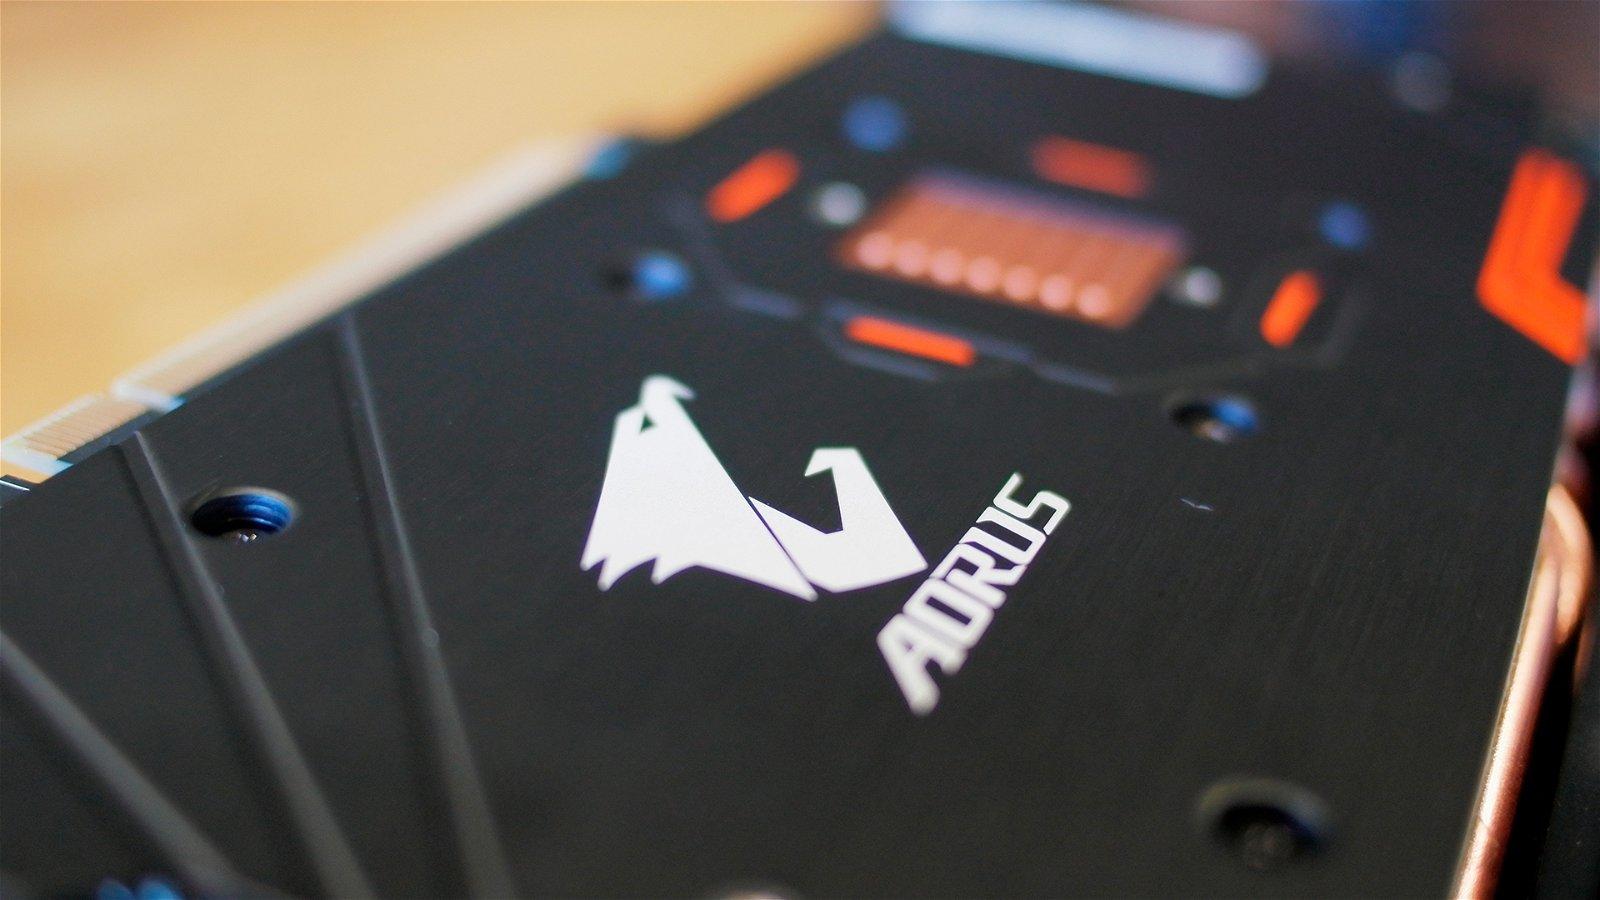 Gigabyte Aorus Rx 570 Gpu (Hardware) Review – A Familiar Refresh 3